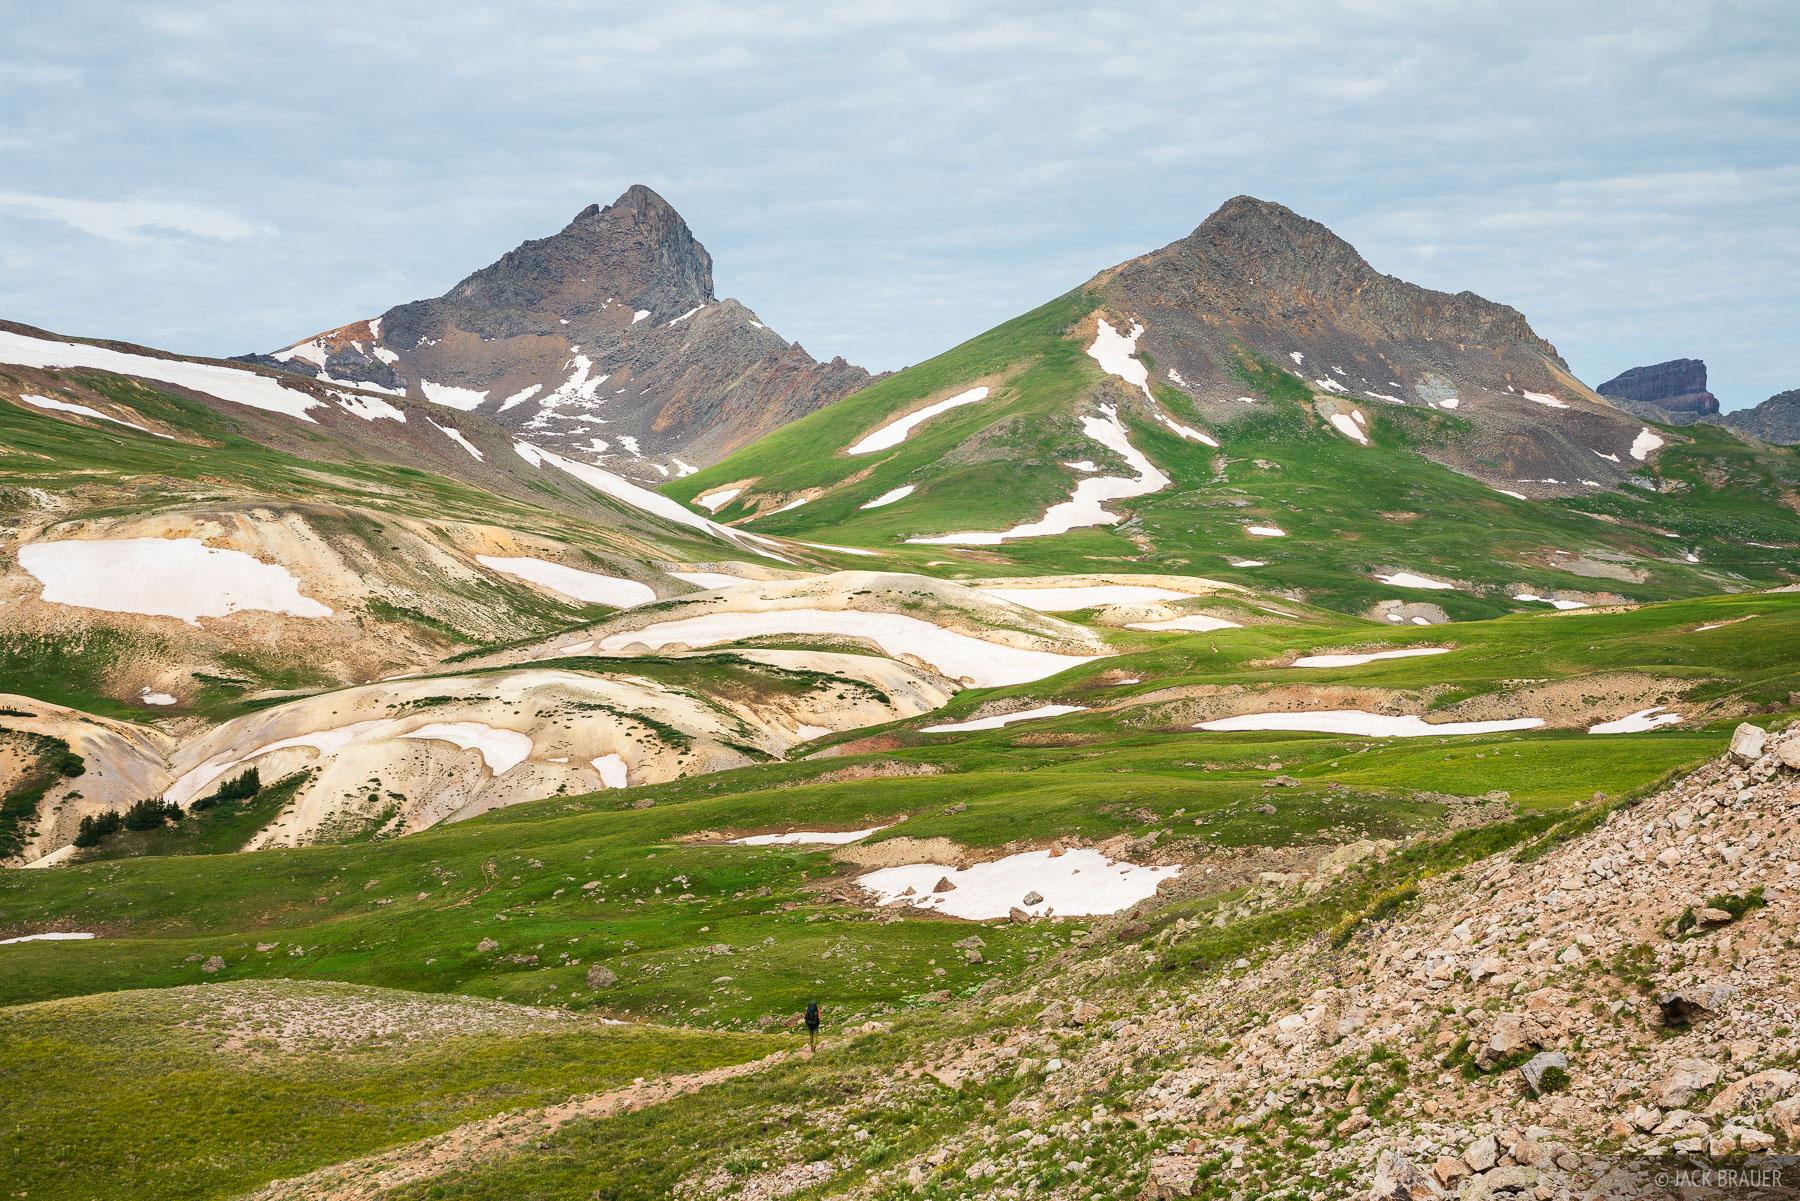 Colorado, Matterhorn Peak, San Juan Mountains, Uncompahgre Wilderness, Wetterhorn Peak, photo